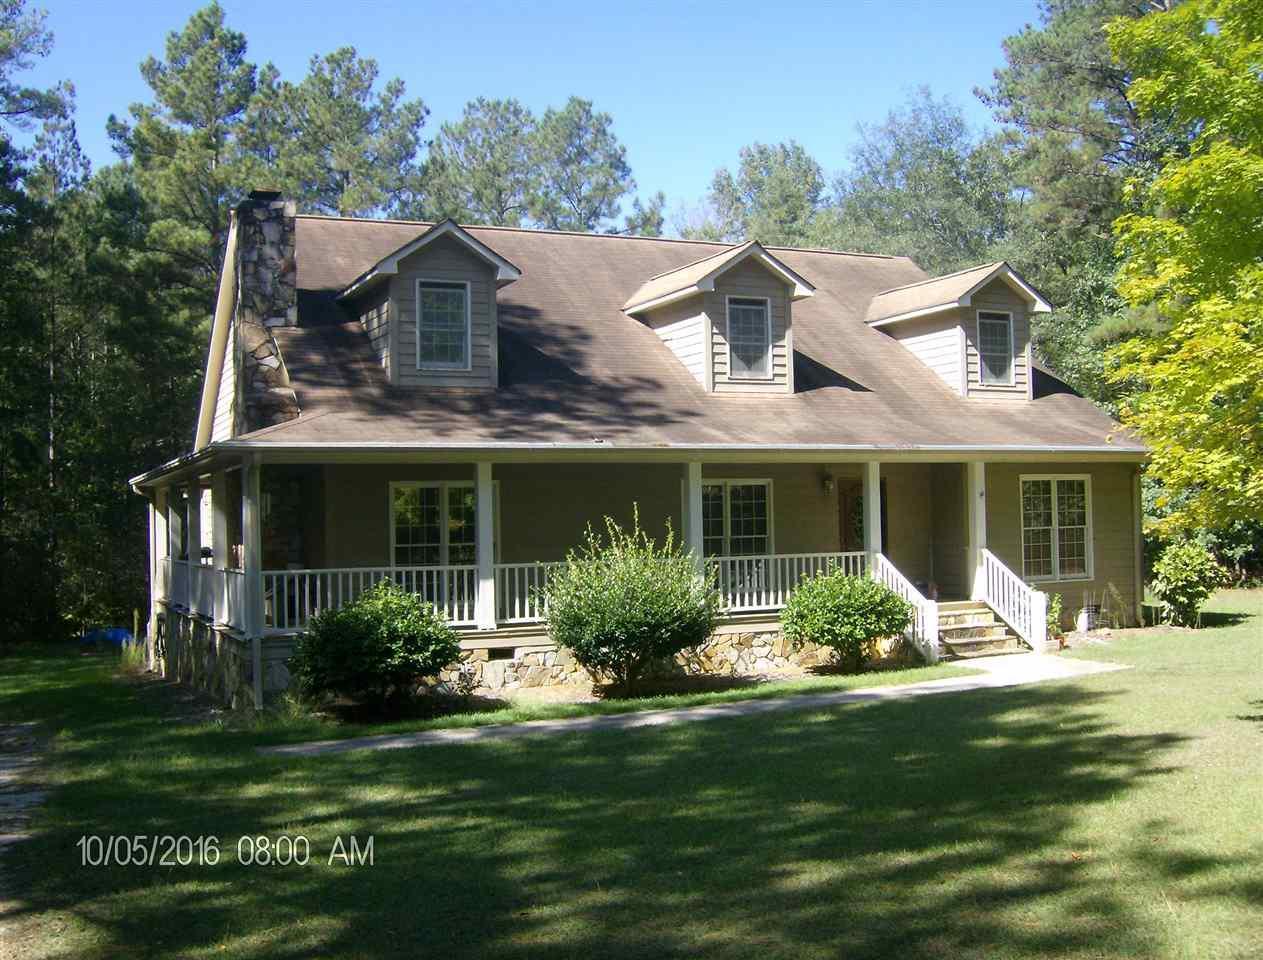 92 Willow Creek Dr., Iva, SC 29655 (MLS #20181289) :: Les Walden Real Estate